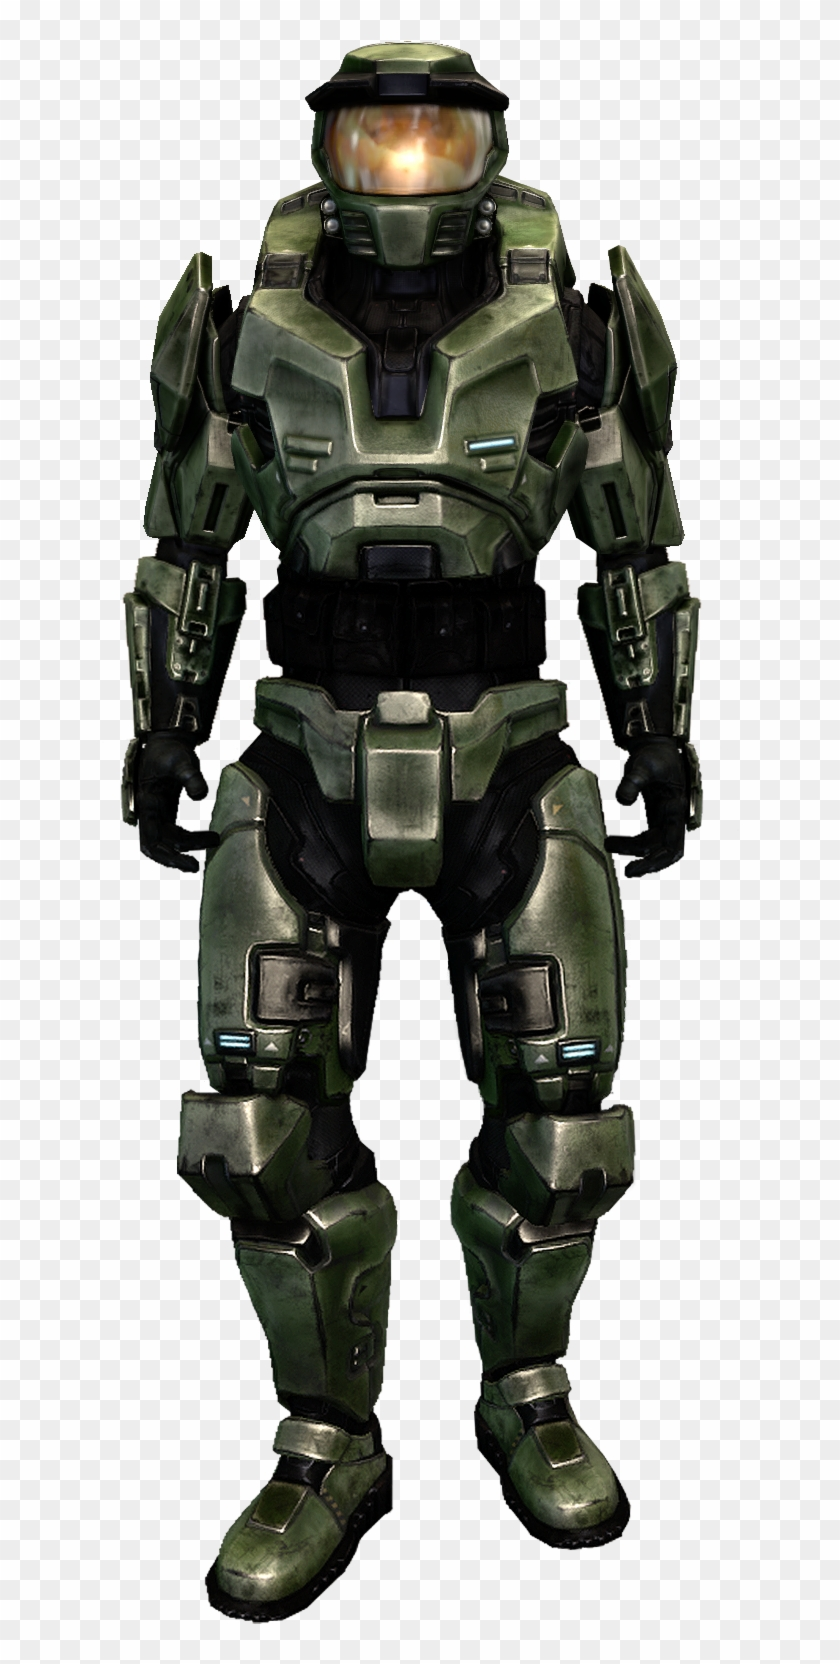 Mjolnir Powered Assault Armor Mark V Halo Anniversary Master